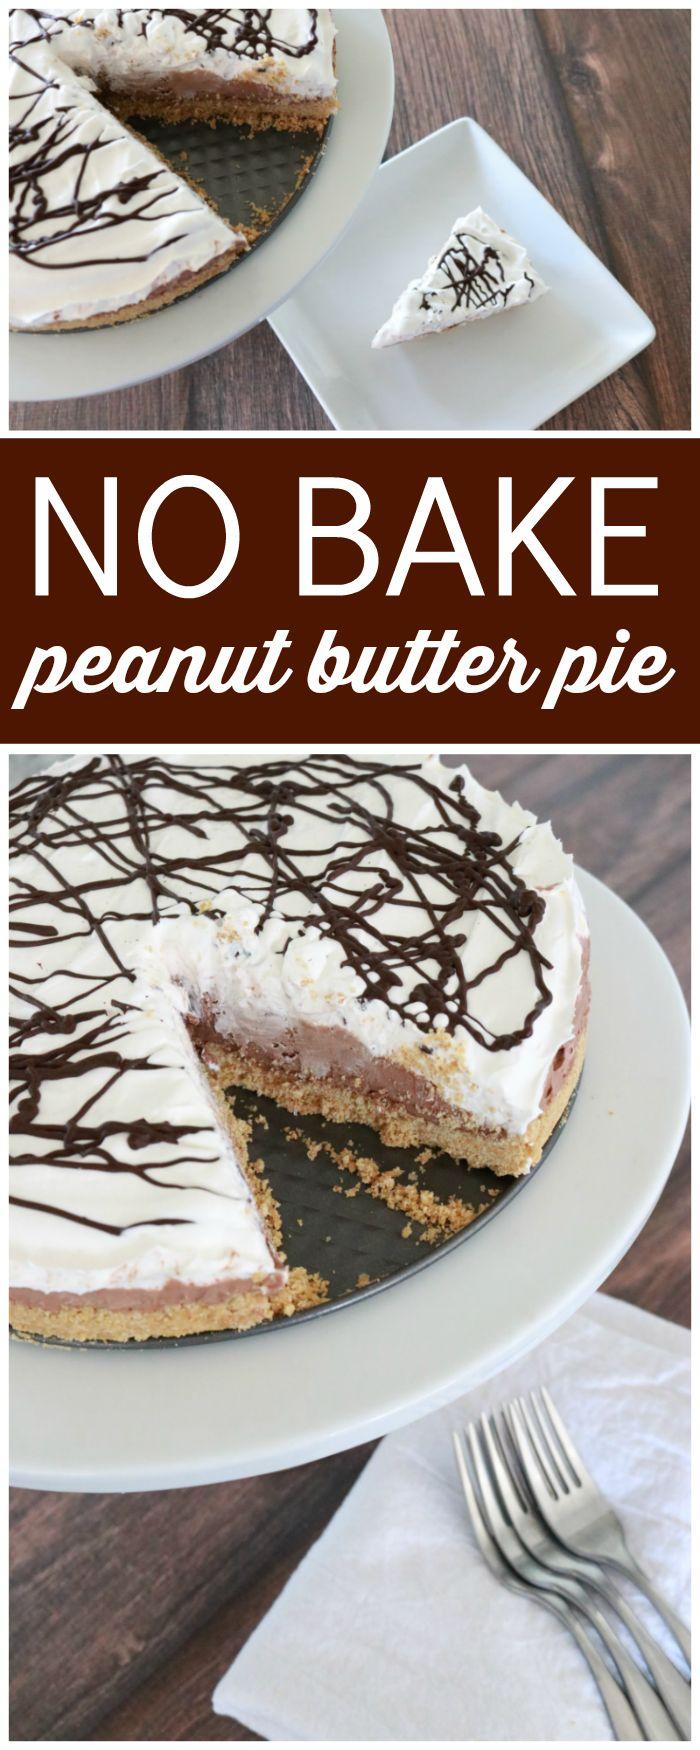 Best 25+ Easy chocolate pie ideas on Pinterest | Easy chocolate ...